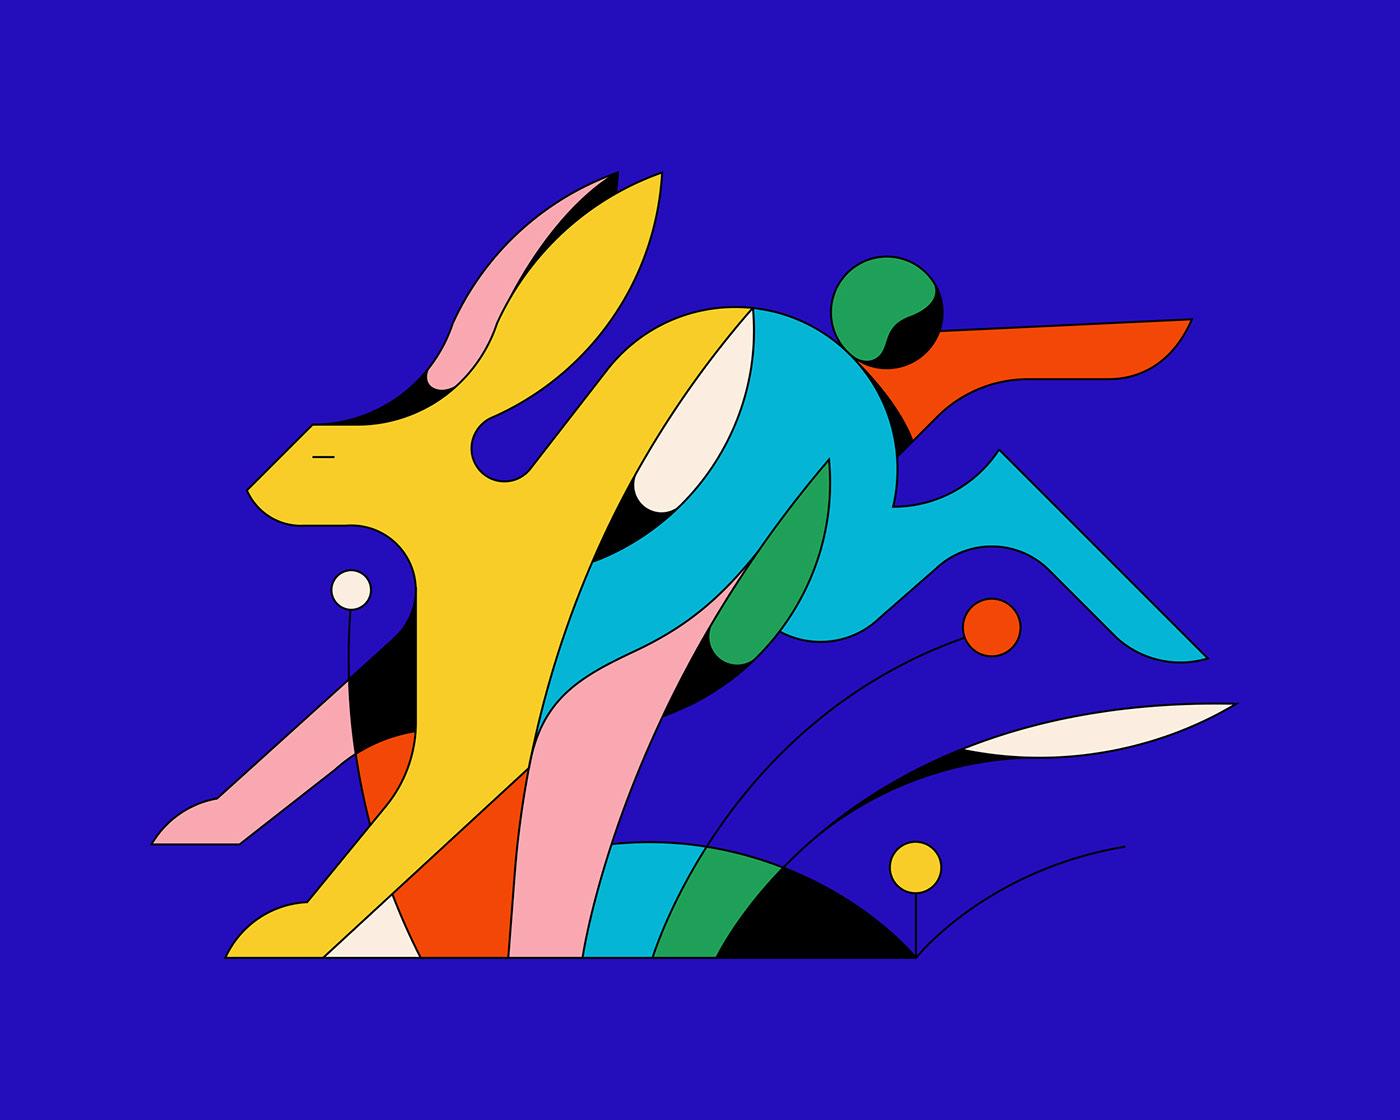 Image may contain: cartoon, vector graphics and drawing